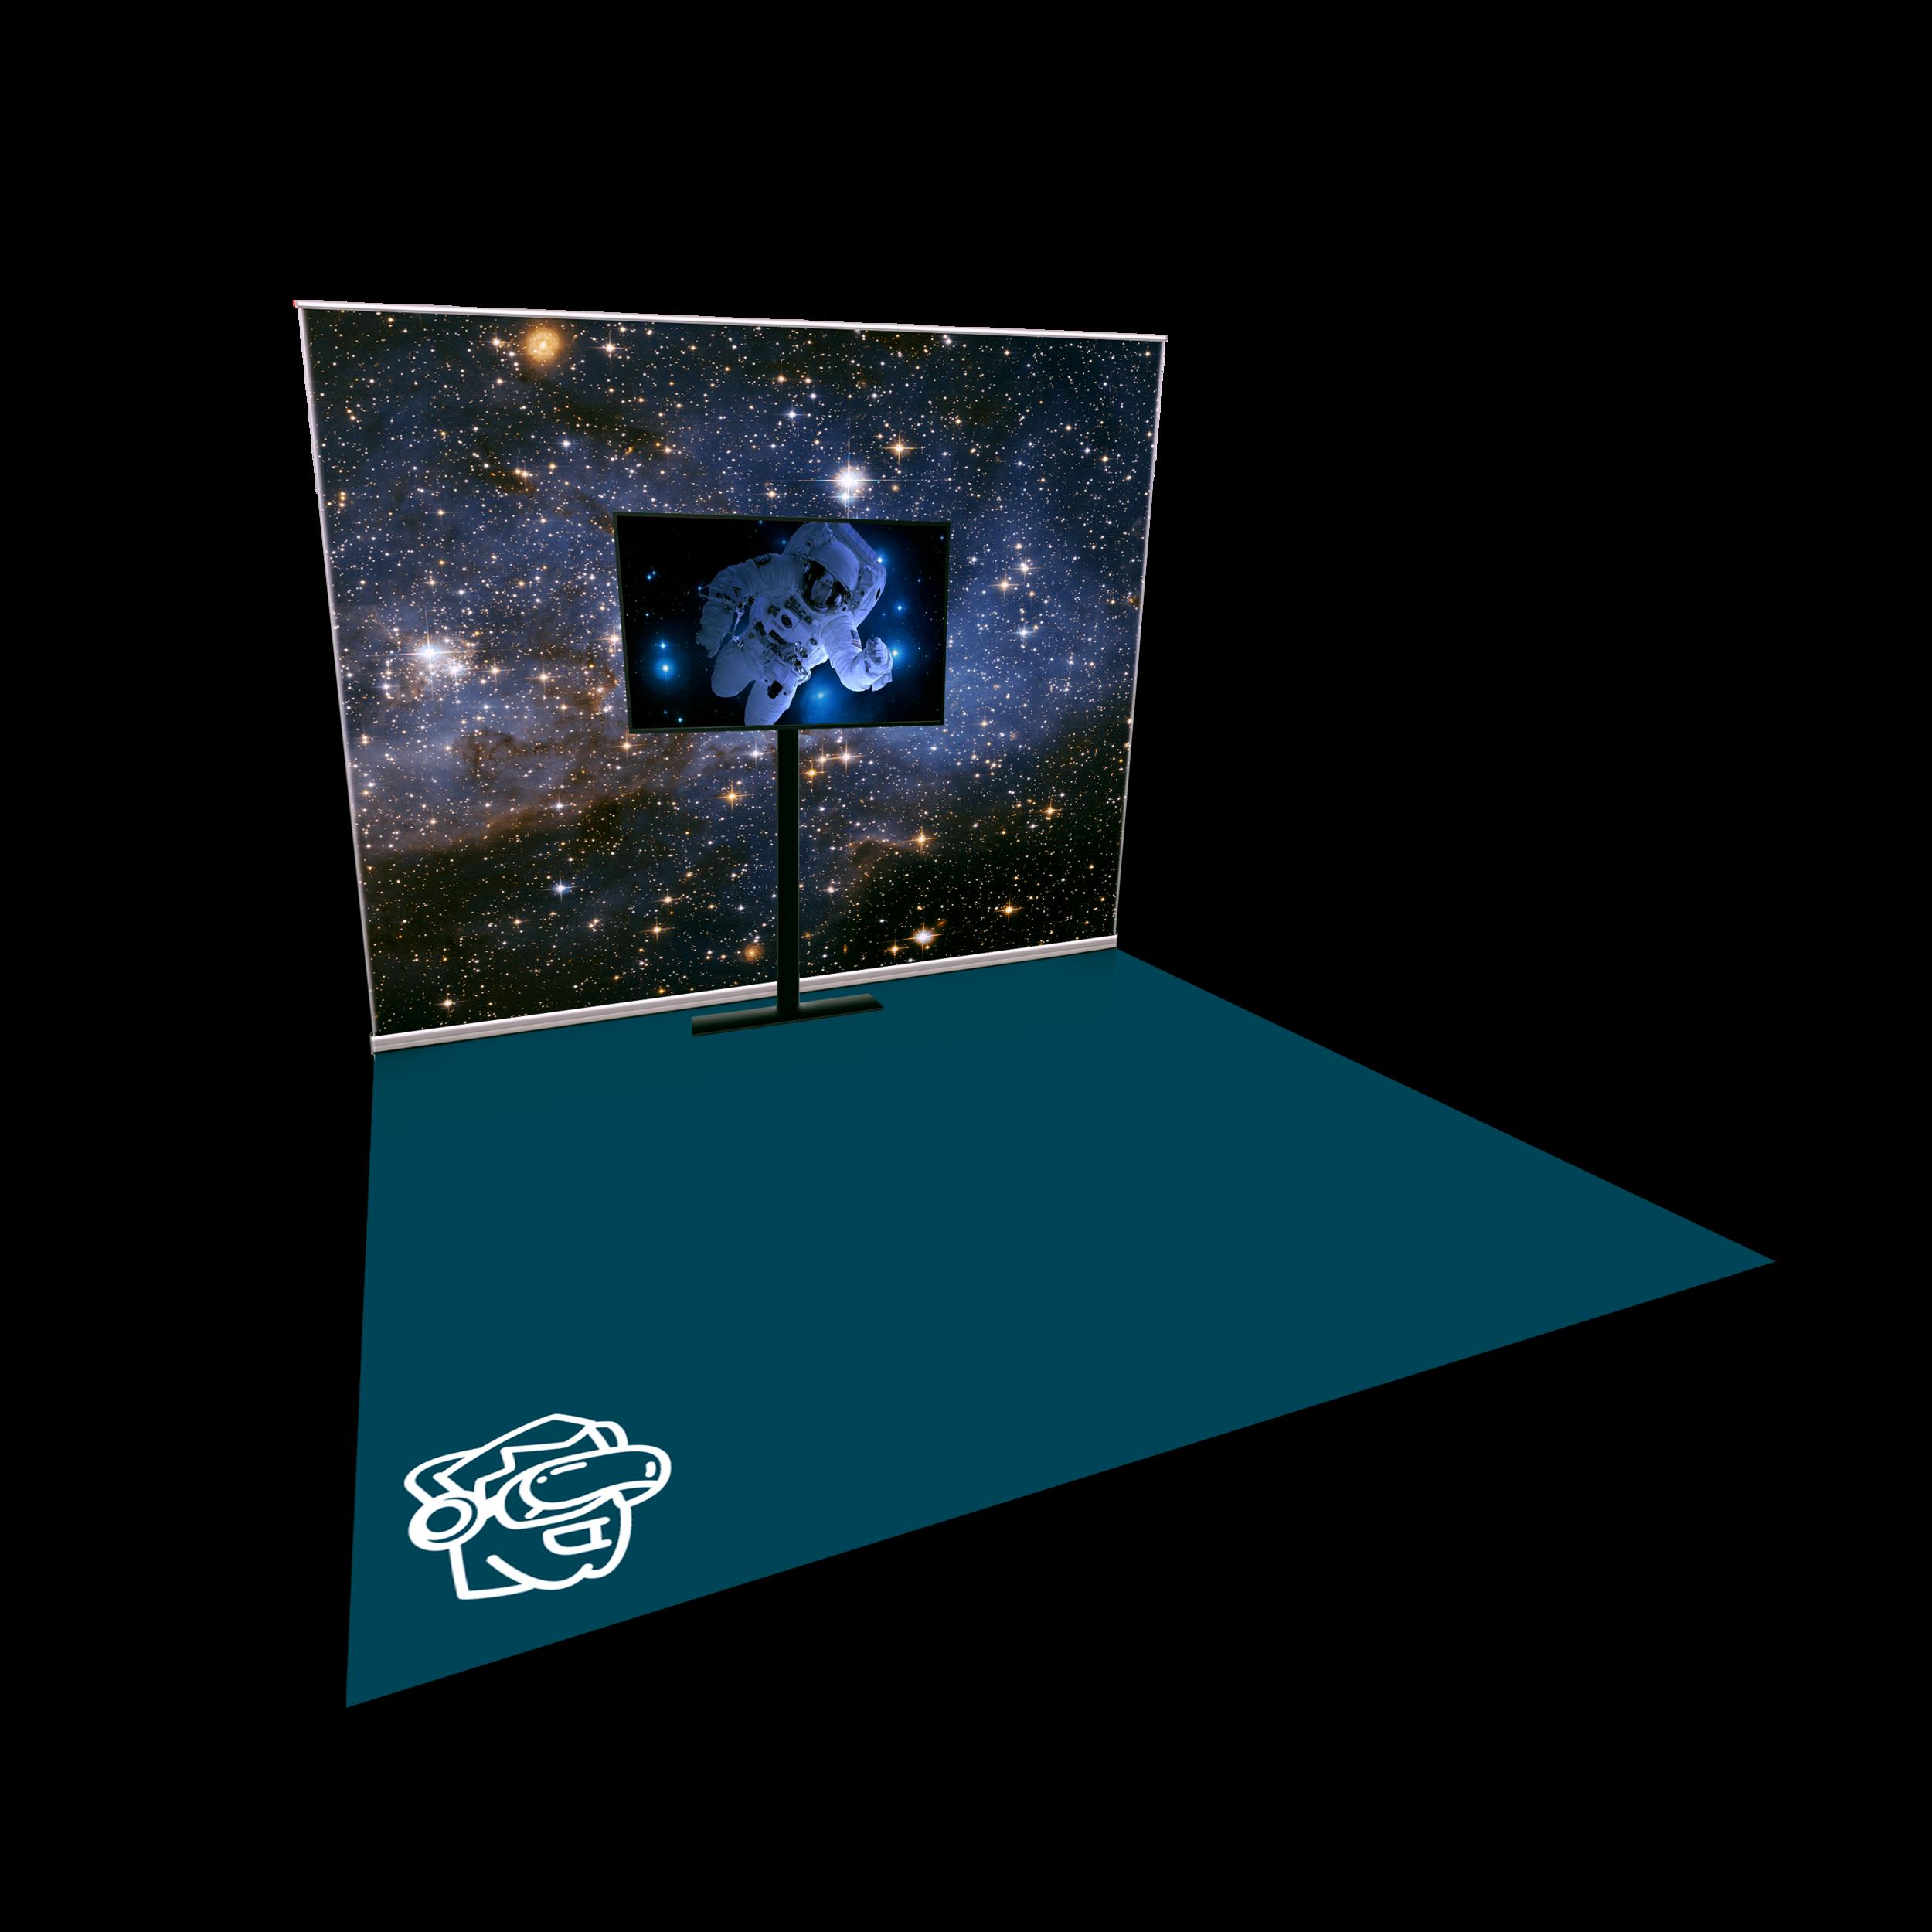 Setup_Mockup_-_VR_Space_Simulator.png